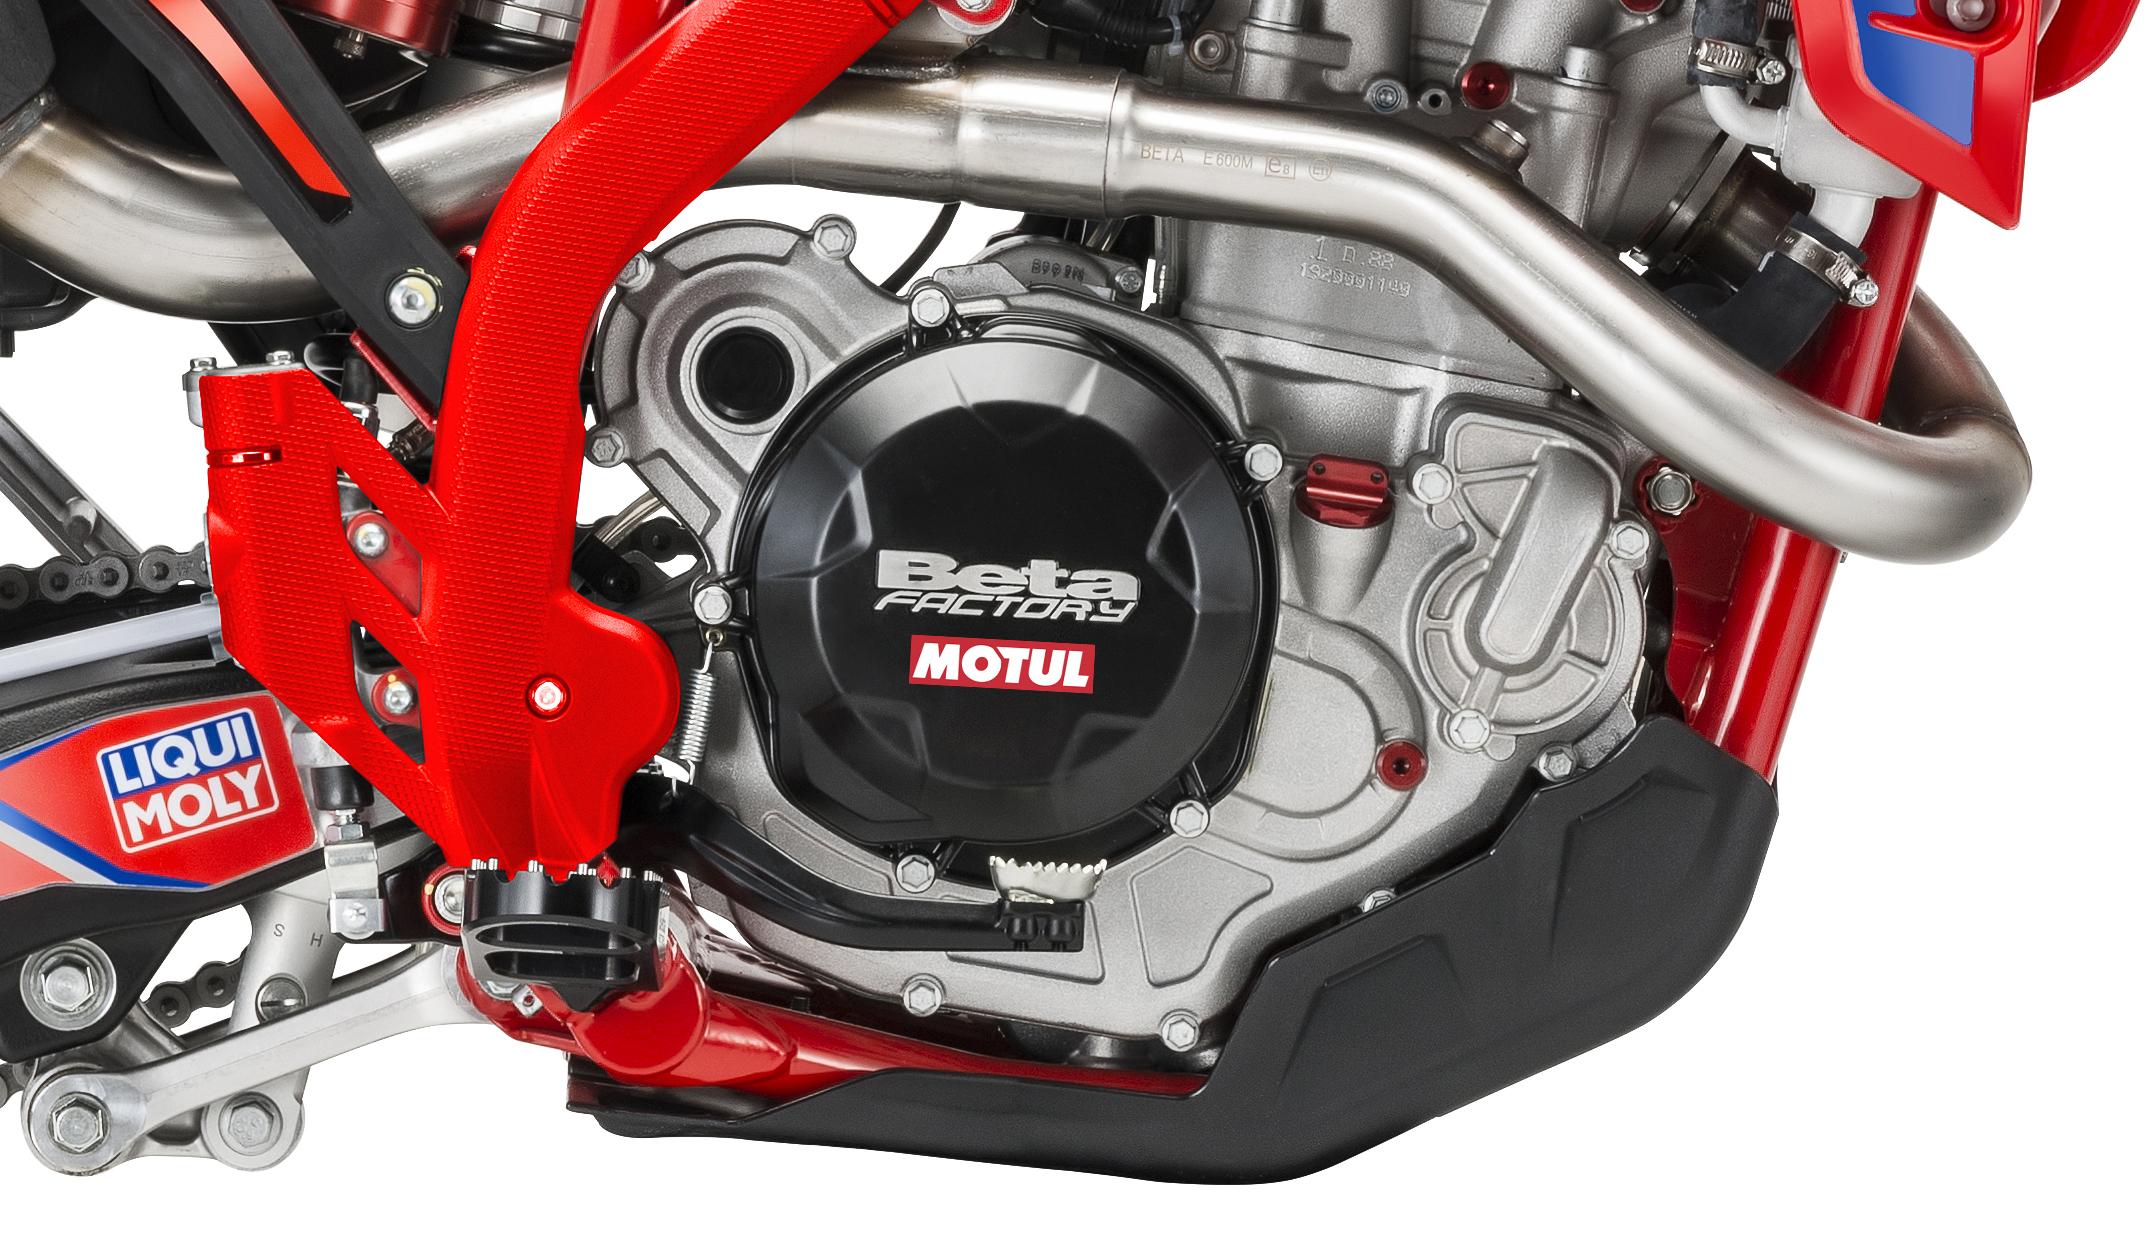 rr-race-edition-4-stroke-right-side-engine.jpg